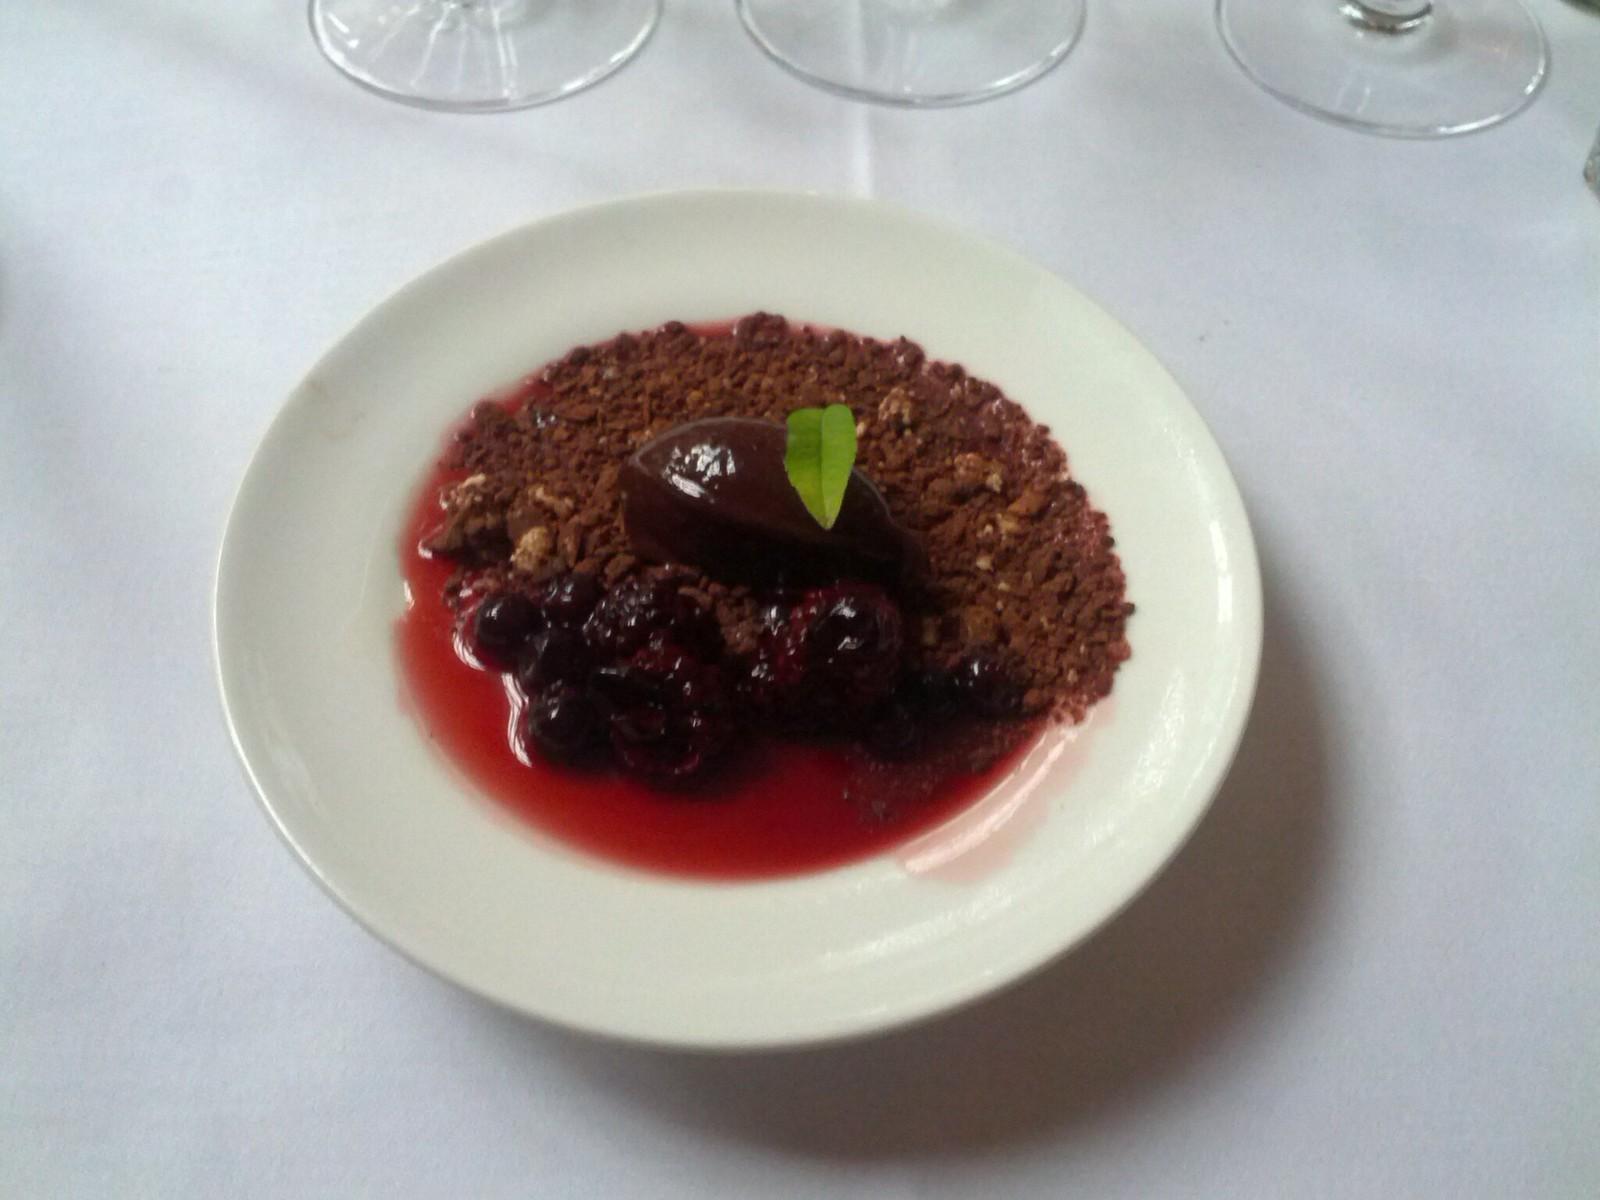 chokolade en surprise, serveret med mørke bær og portvin